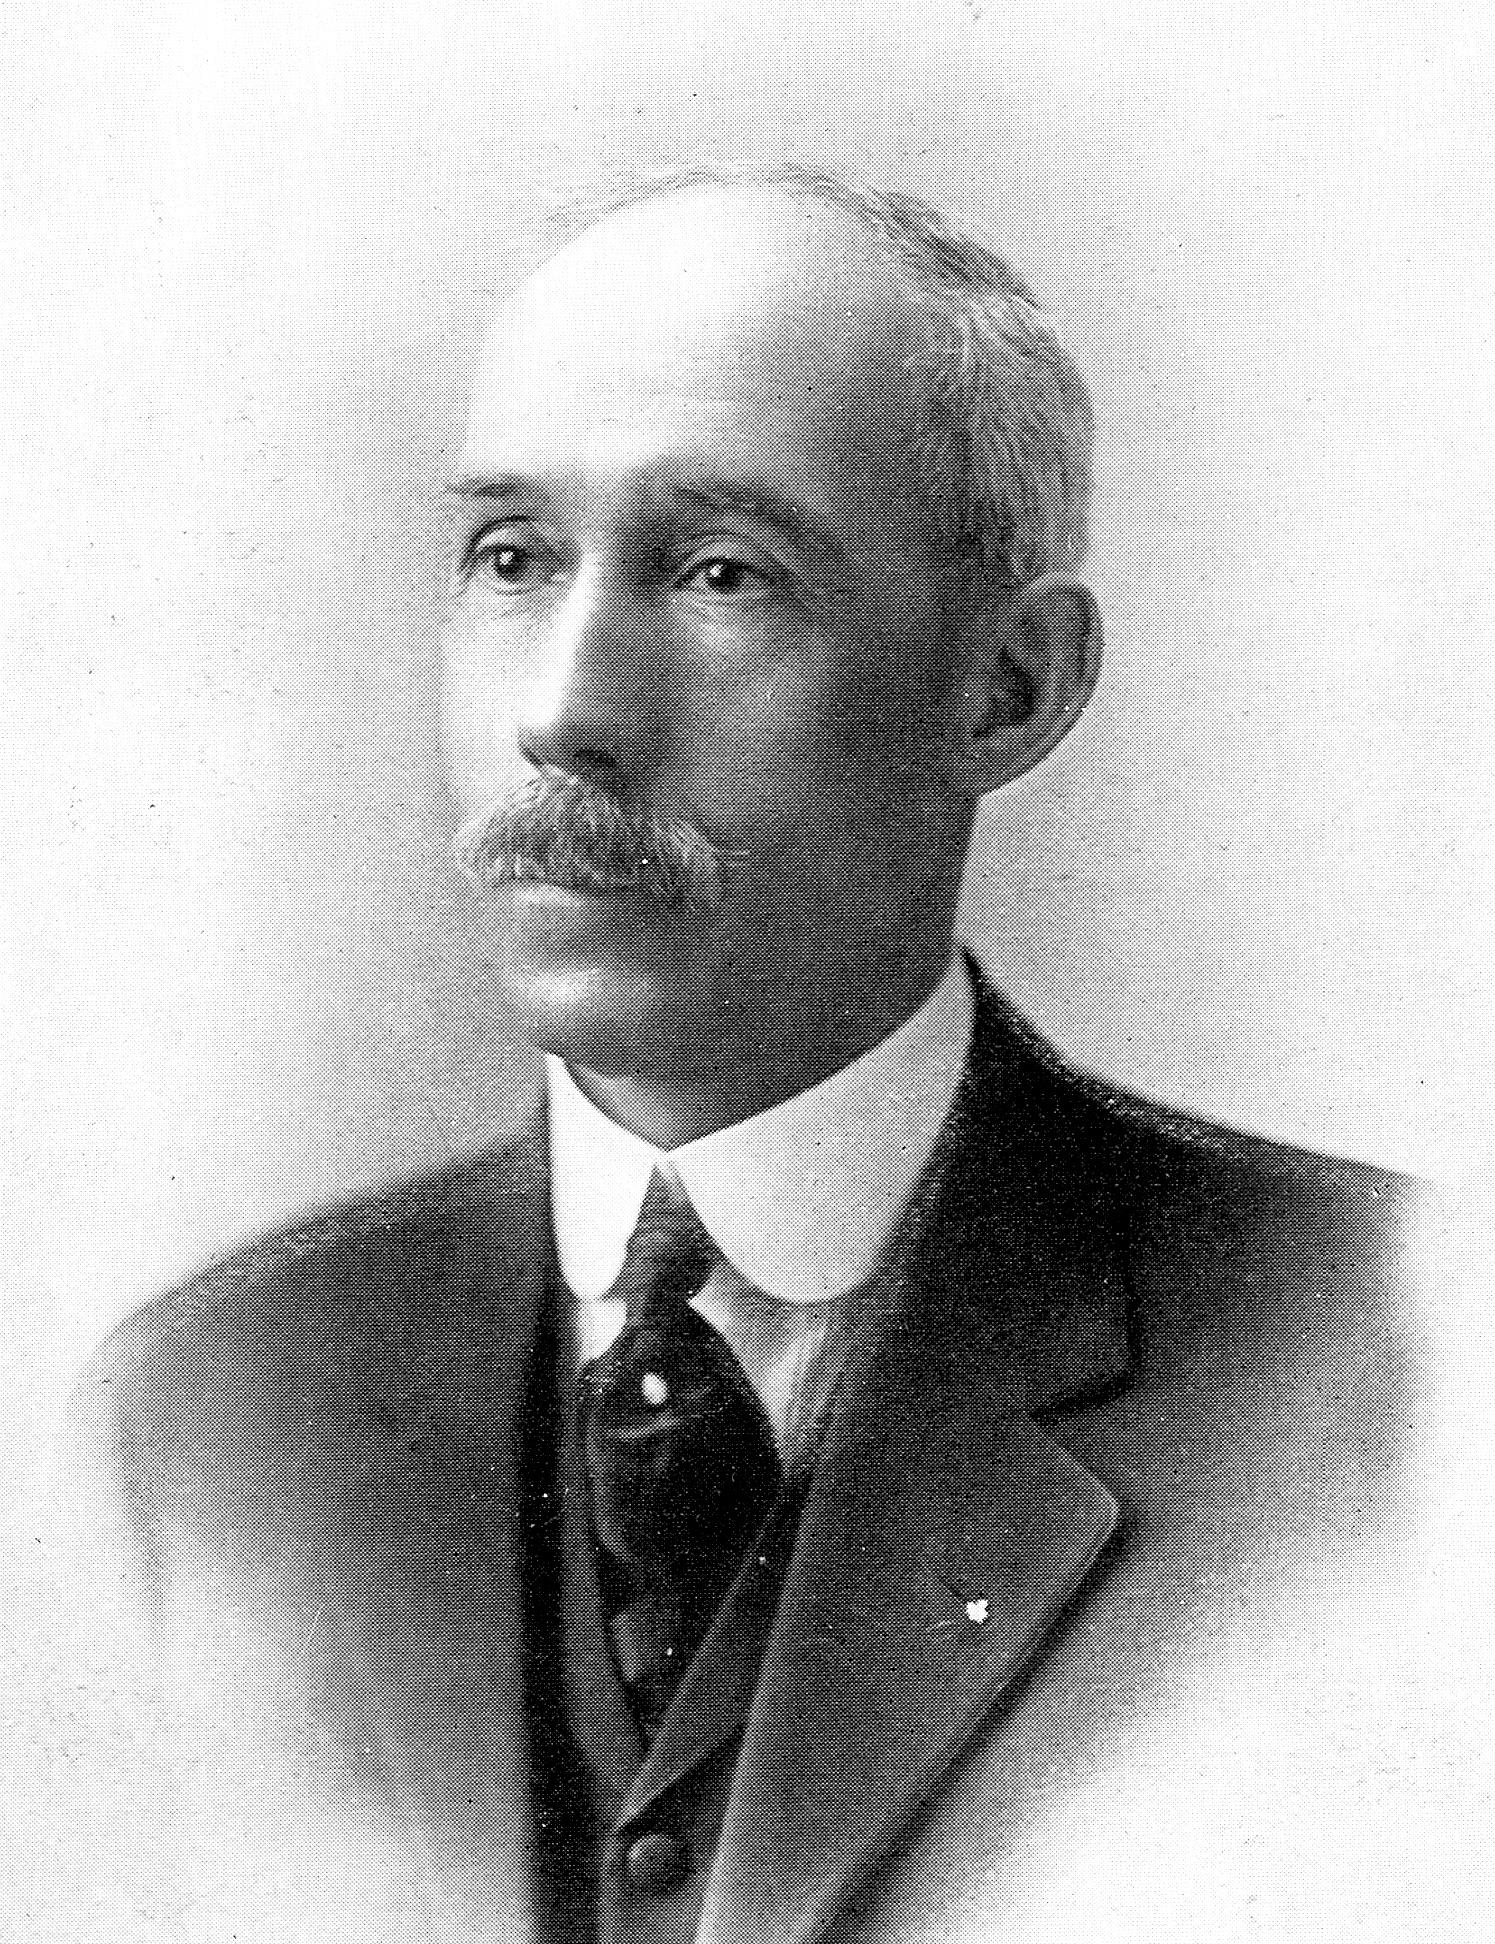 Vandyke 1921